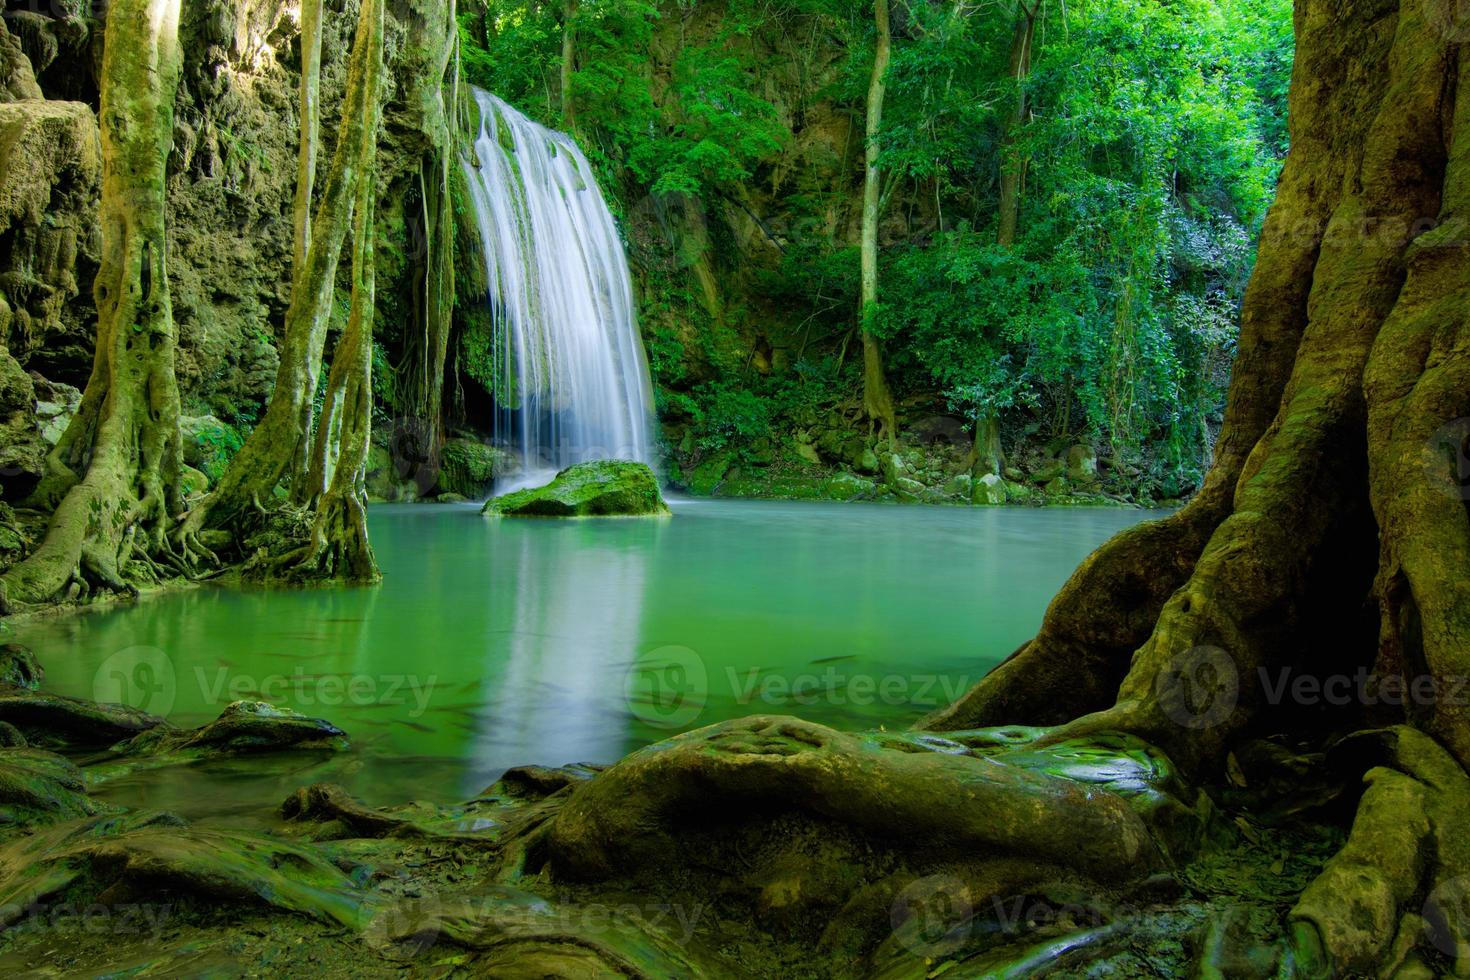 Caida De Agua En El Bosque Verde 1980736 Foto De Stock En Vecteezy